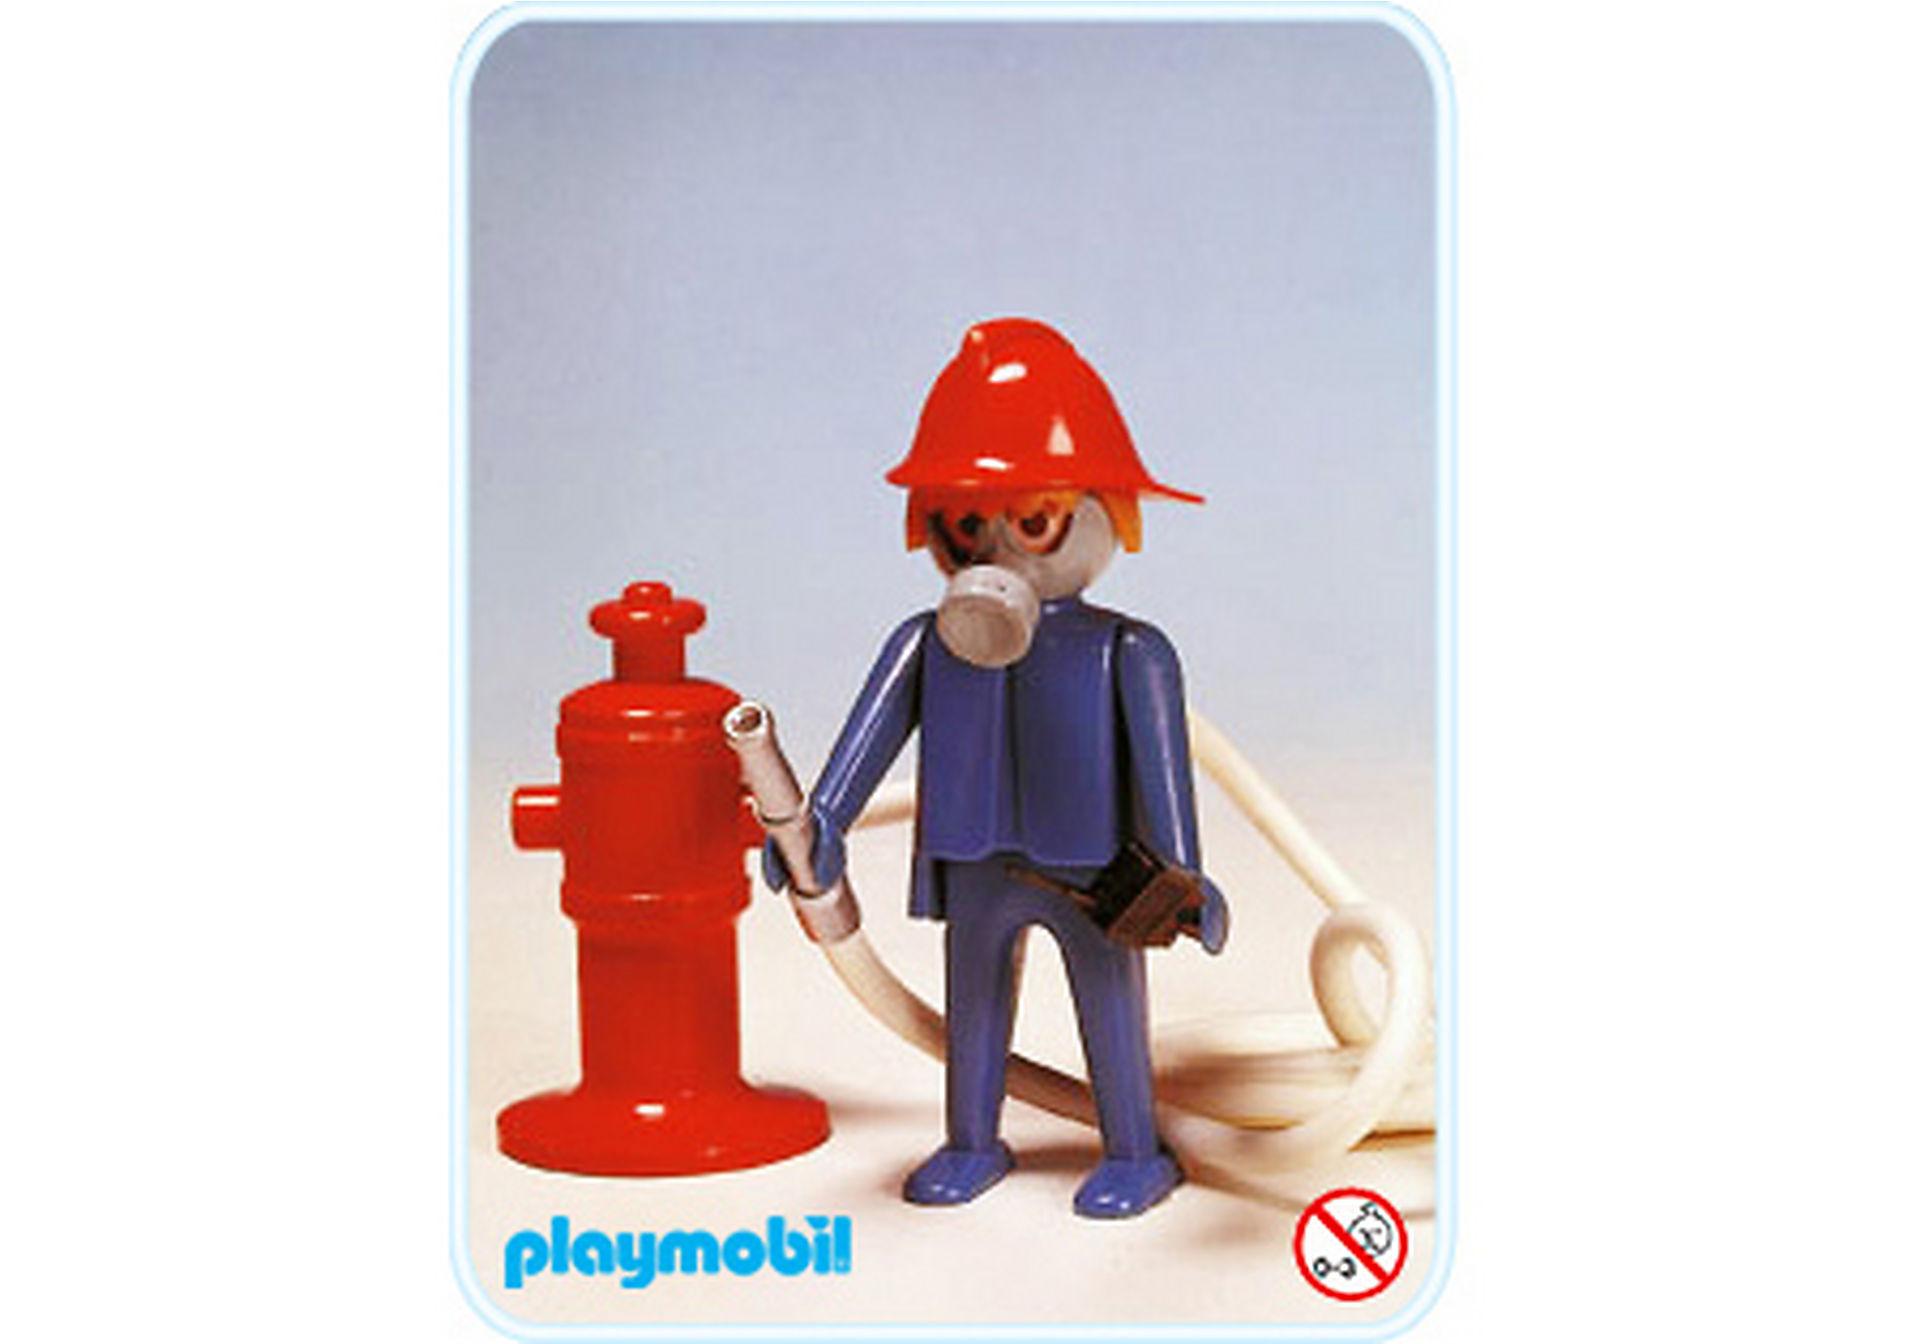 http://media.playmobil.com/i/playmobil/3367-A_product_detail/Feuerwehrmann/Hydrant